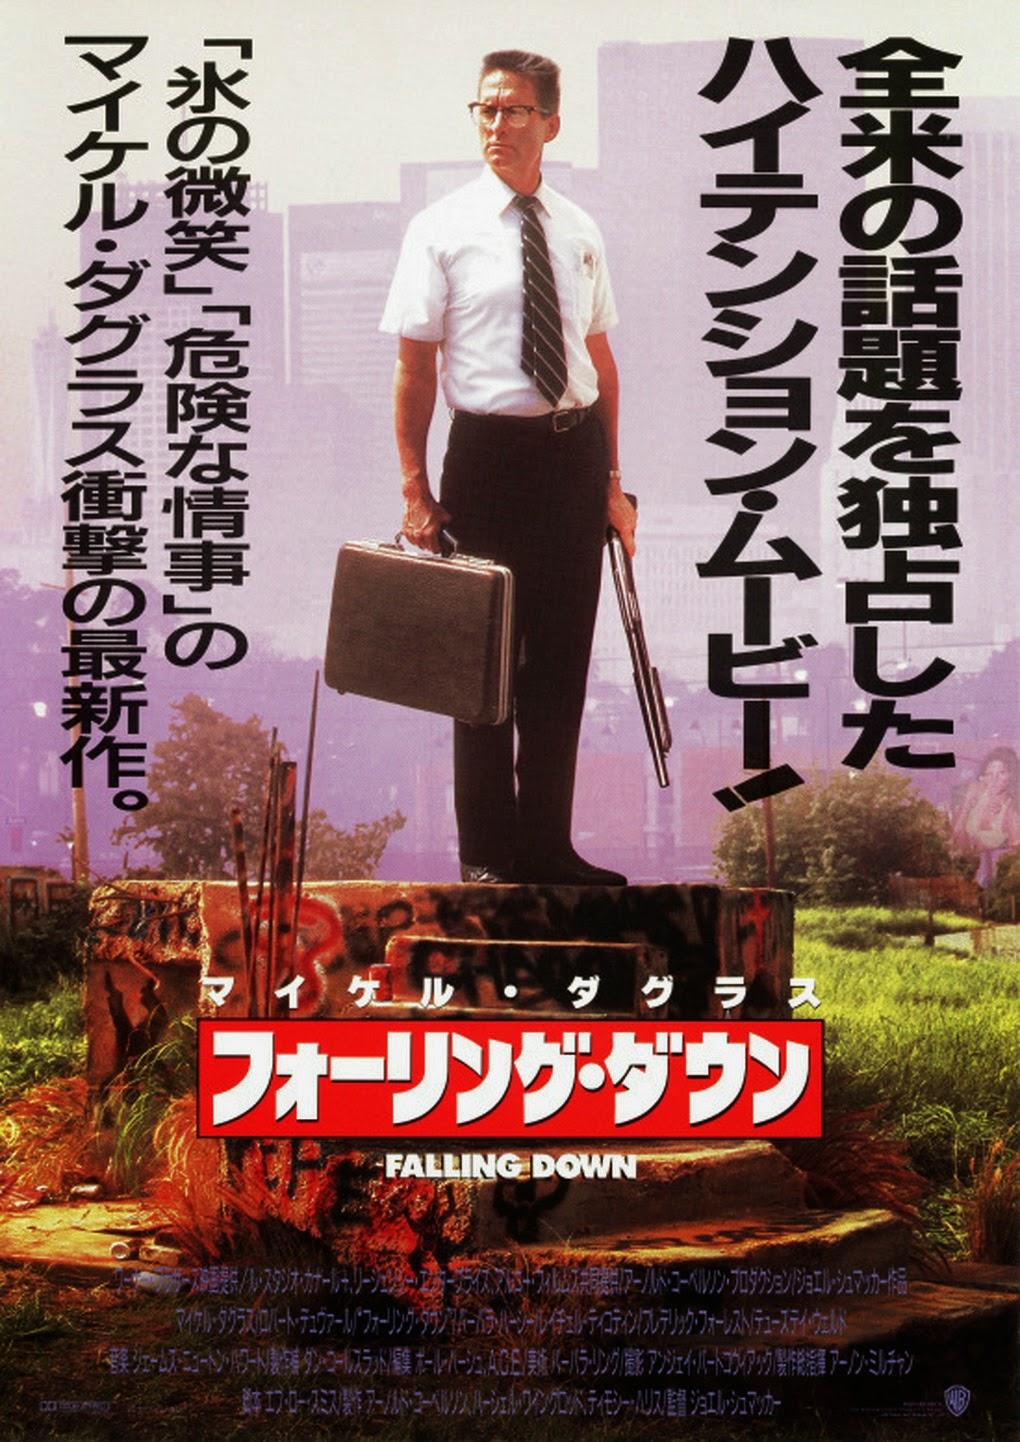 Falling Down Japanese poster